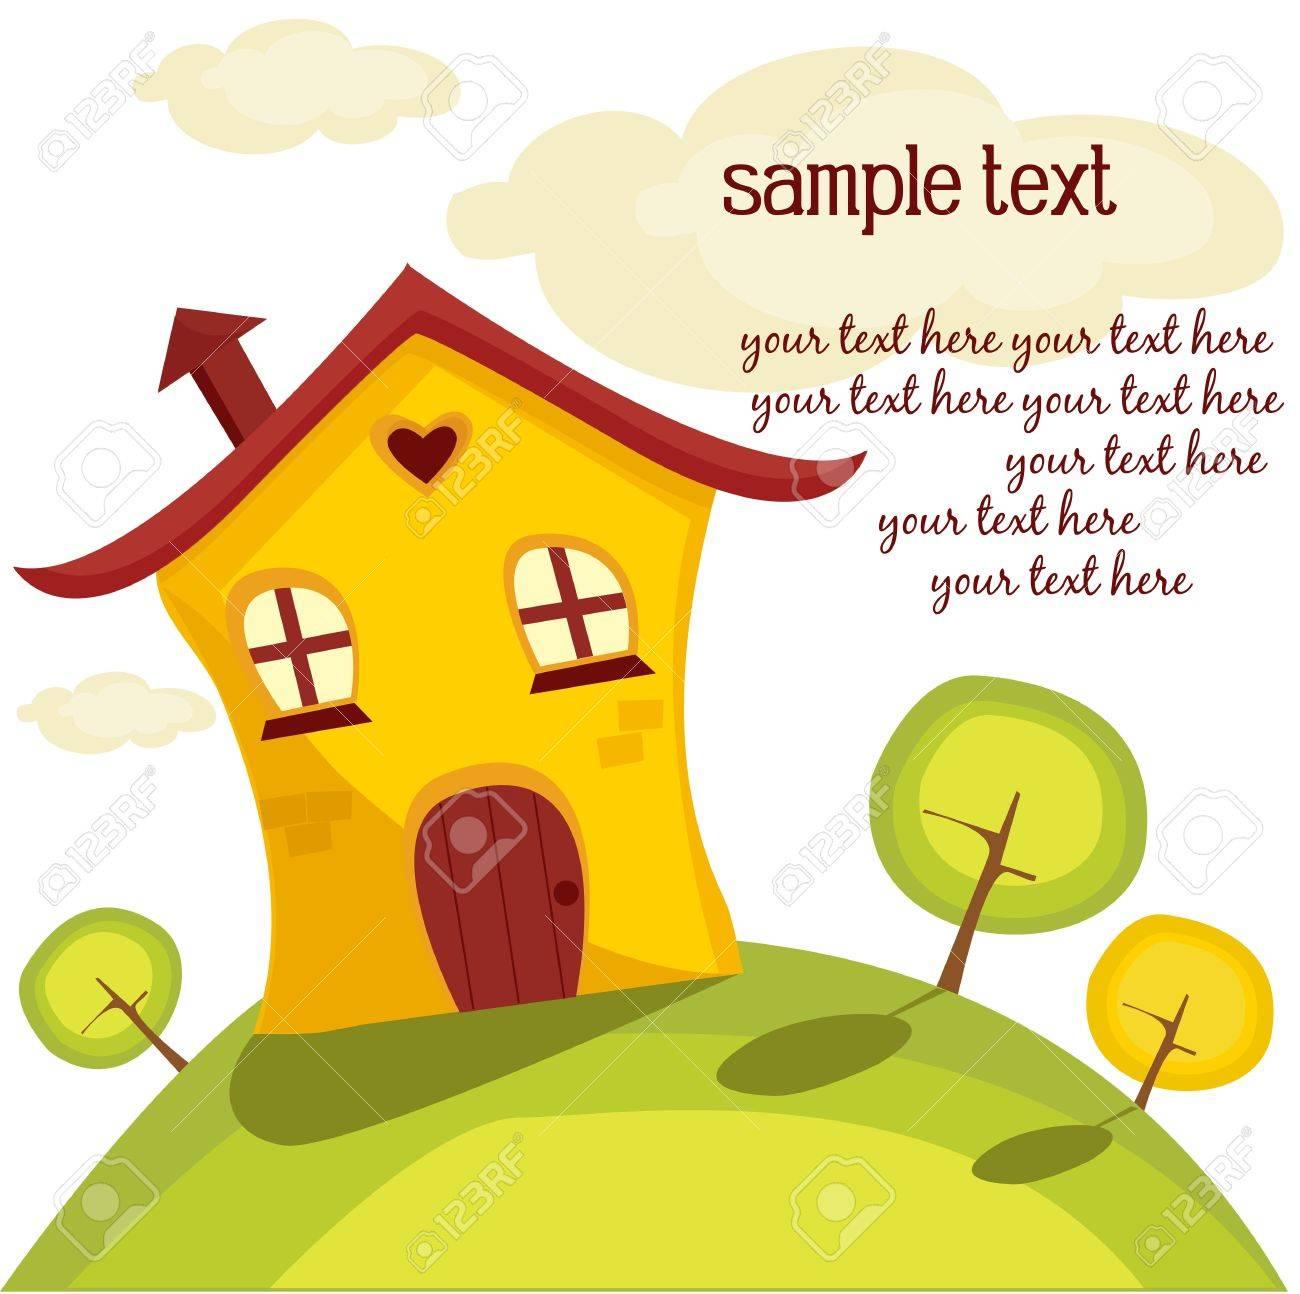 Cute House, Vector Illustration Royalty Free Cliparts, Vectors ...